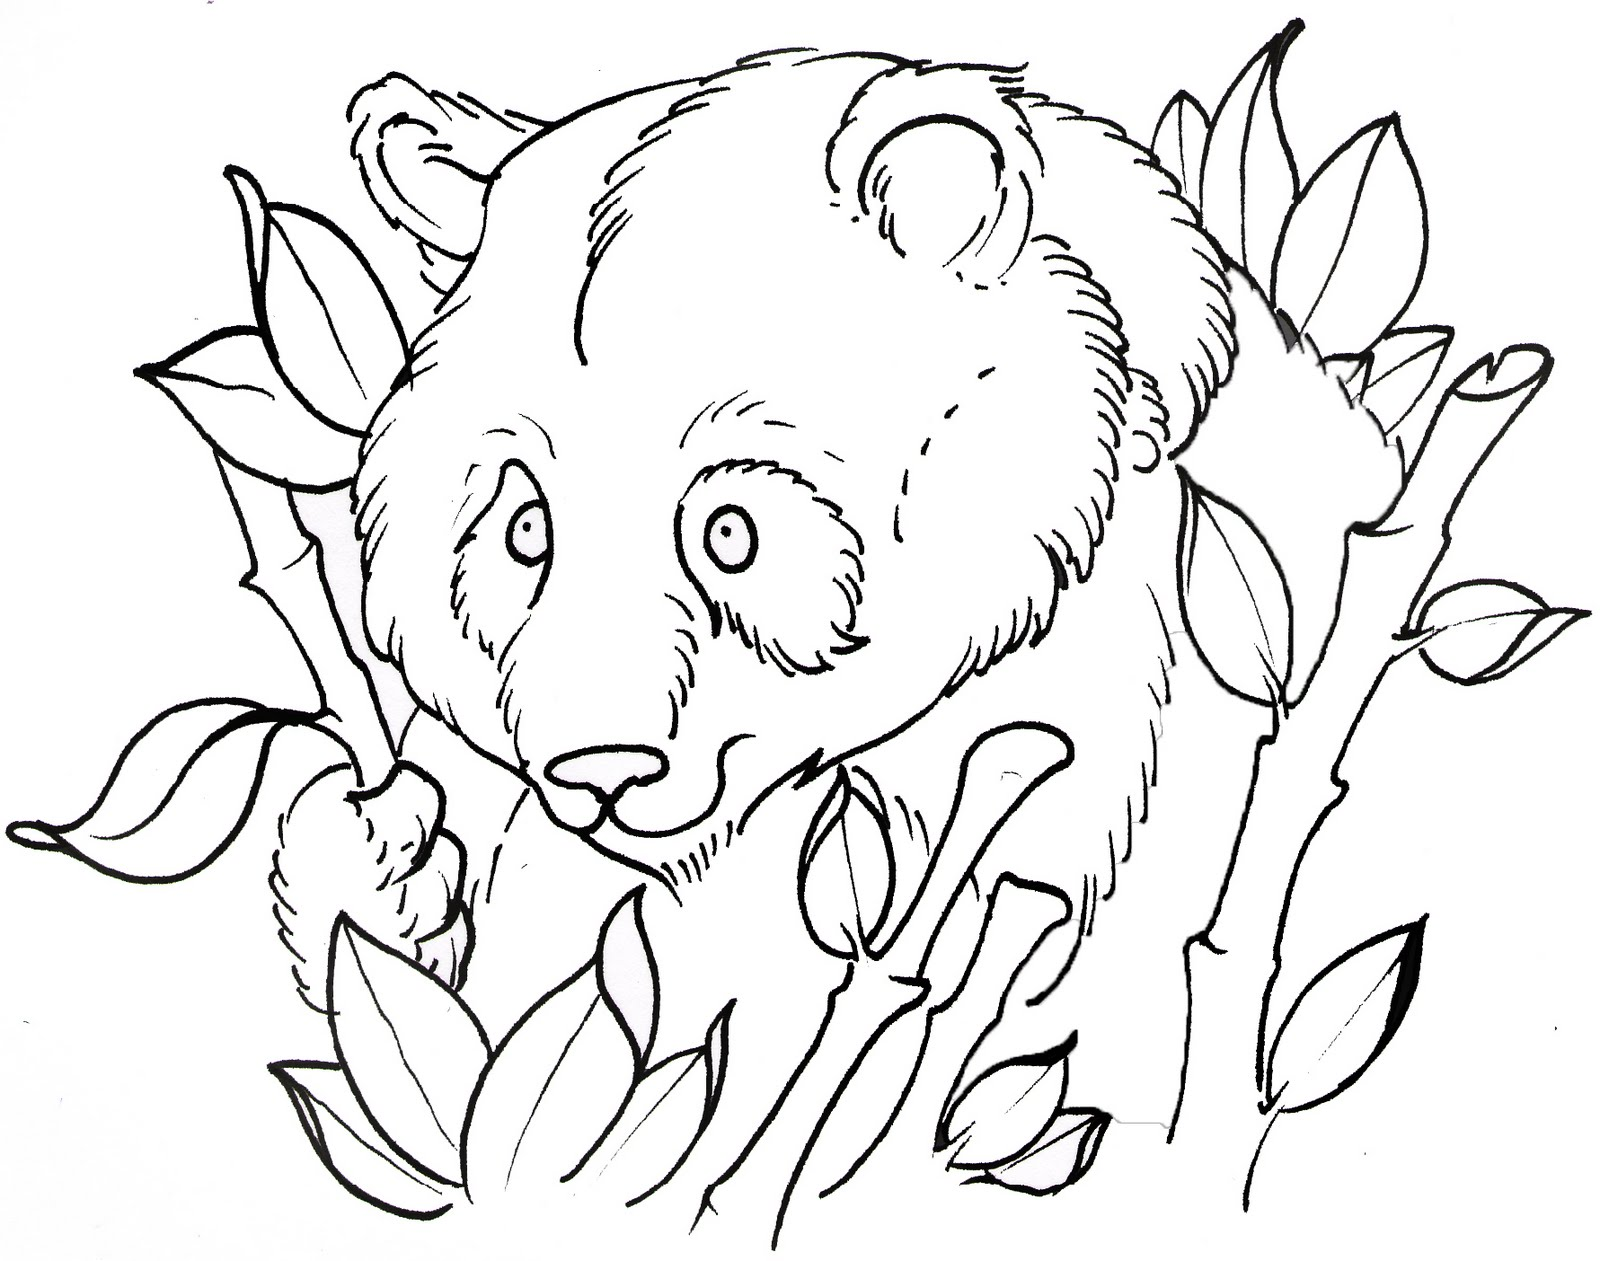 Traditional Tattoo Line Drawing : Joshmartinart